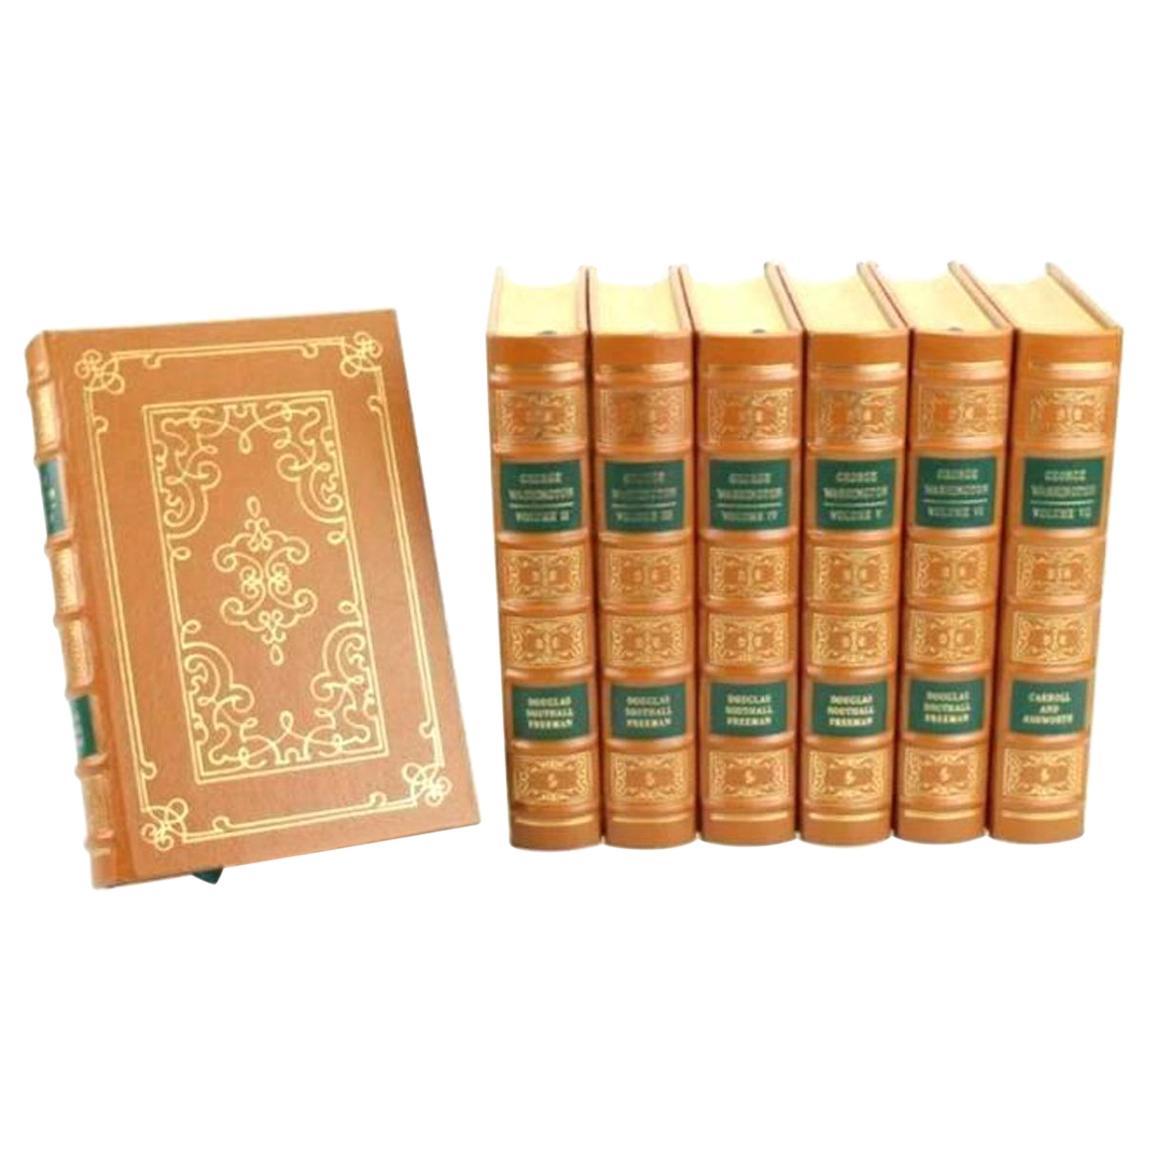 George Washington A Biography by Douglas Southall Freeman, Collector's Edition